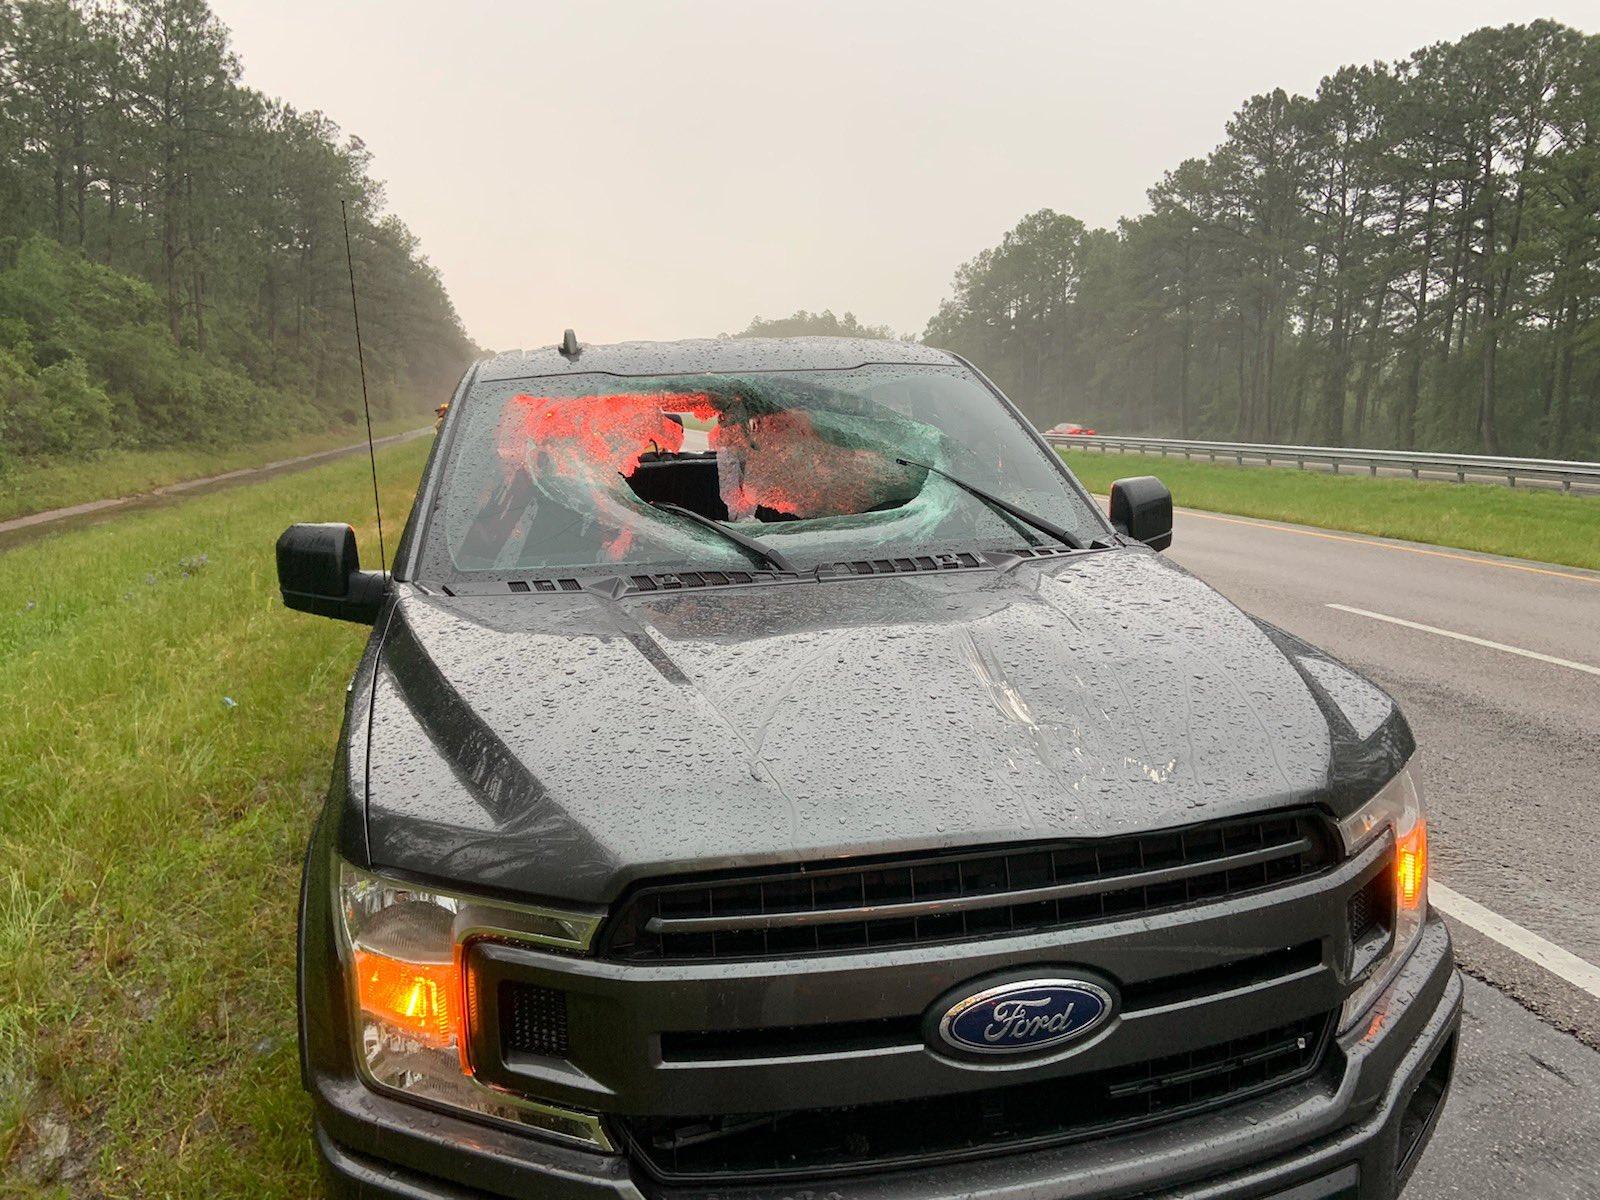 F-150 atingida por raio na Flórida